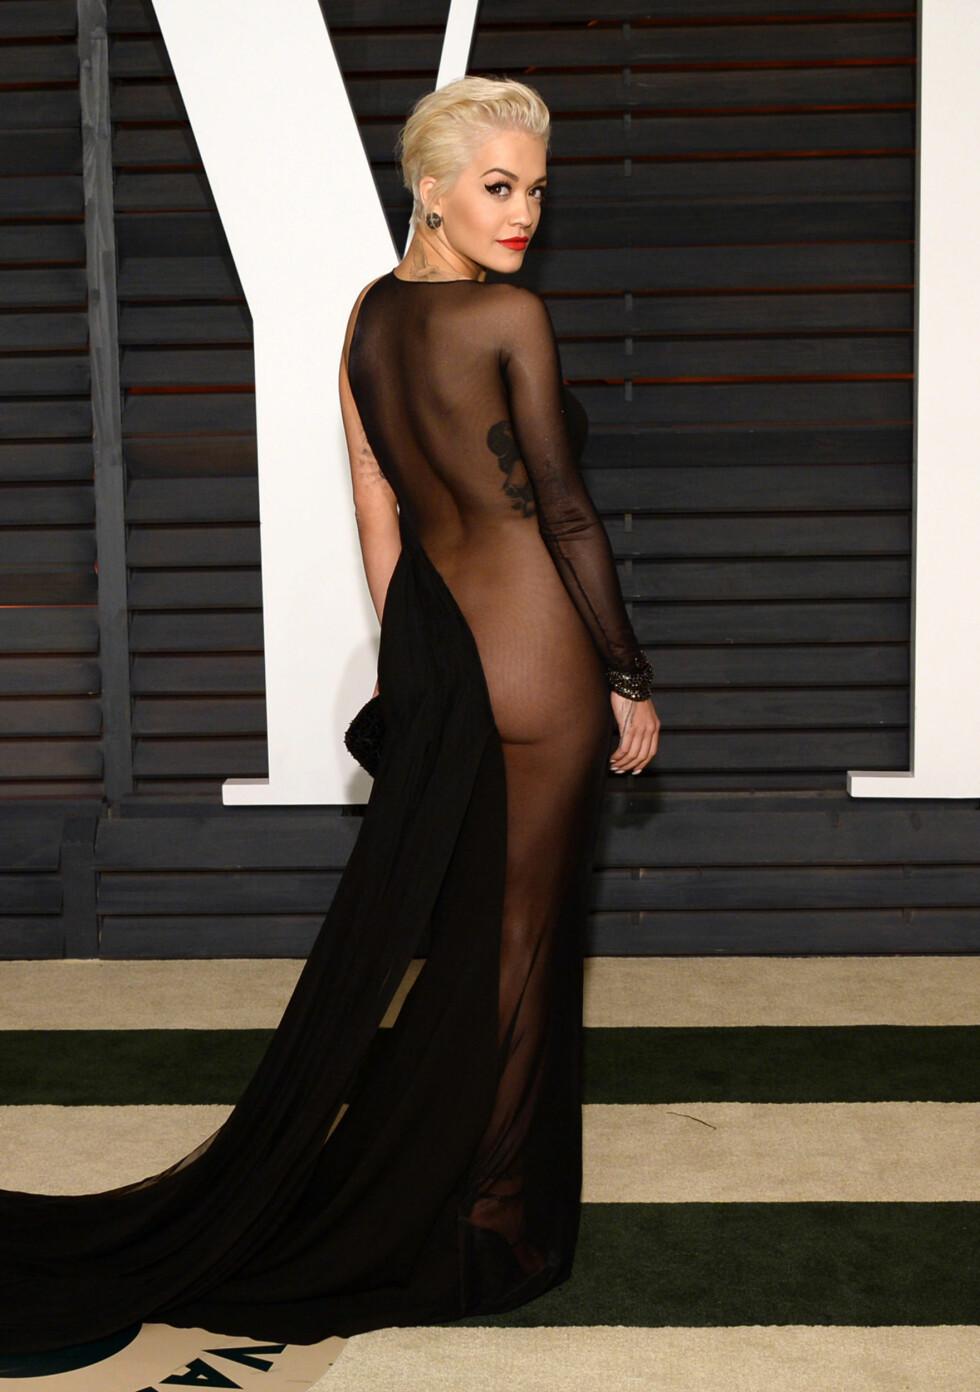 SMEKKER BAKENDE: Artist Rita Ora fotografert under Vanity Fair Oscar Party i fjor. Foto: NTB Scanpix